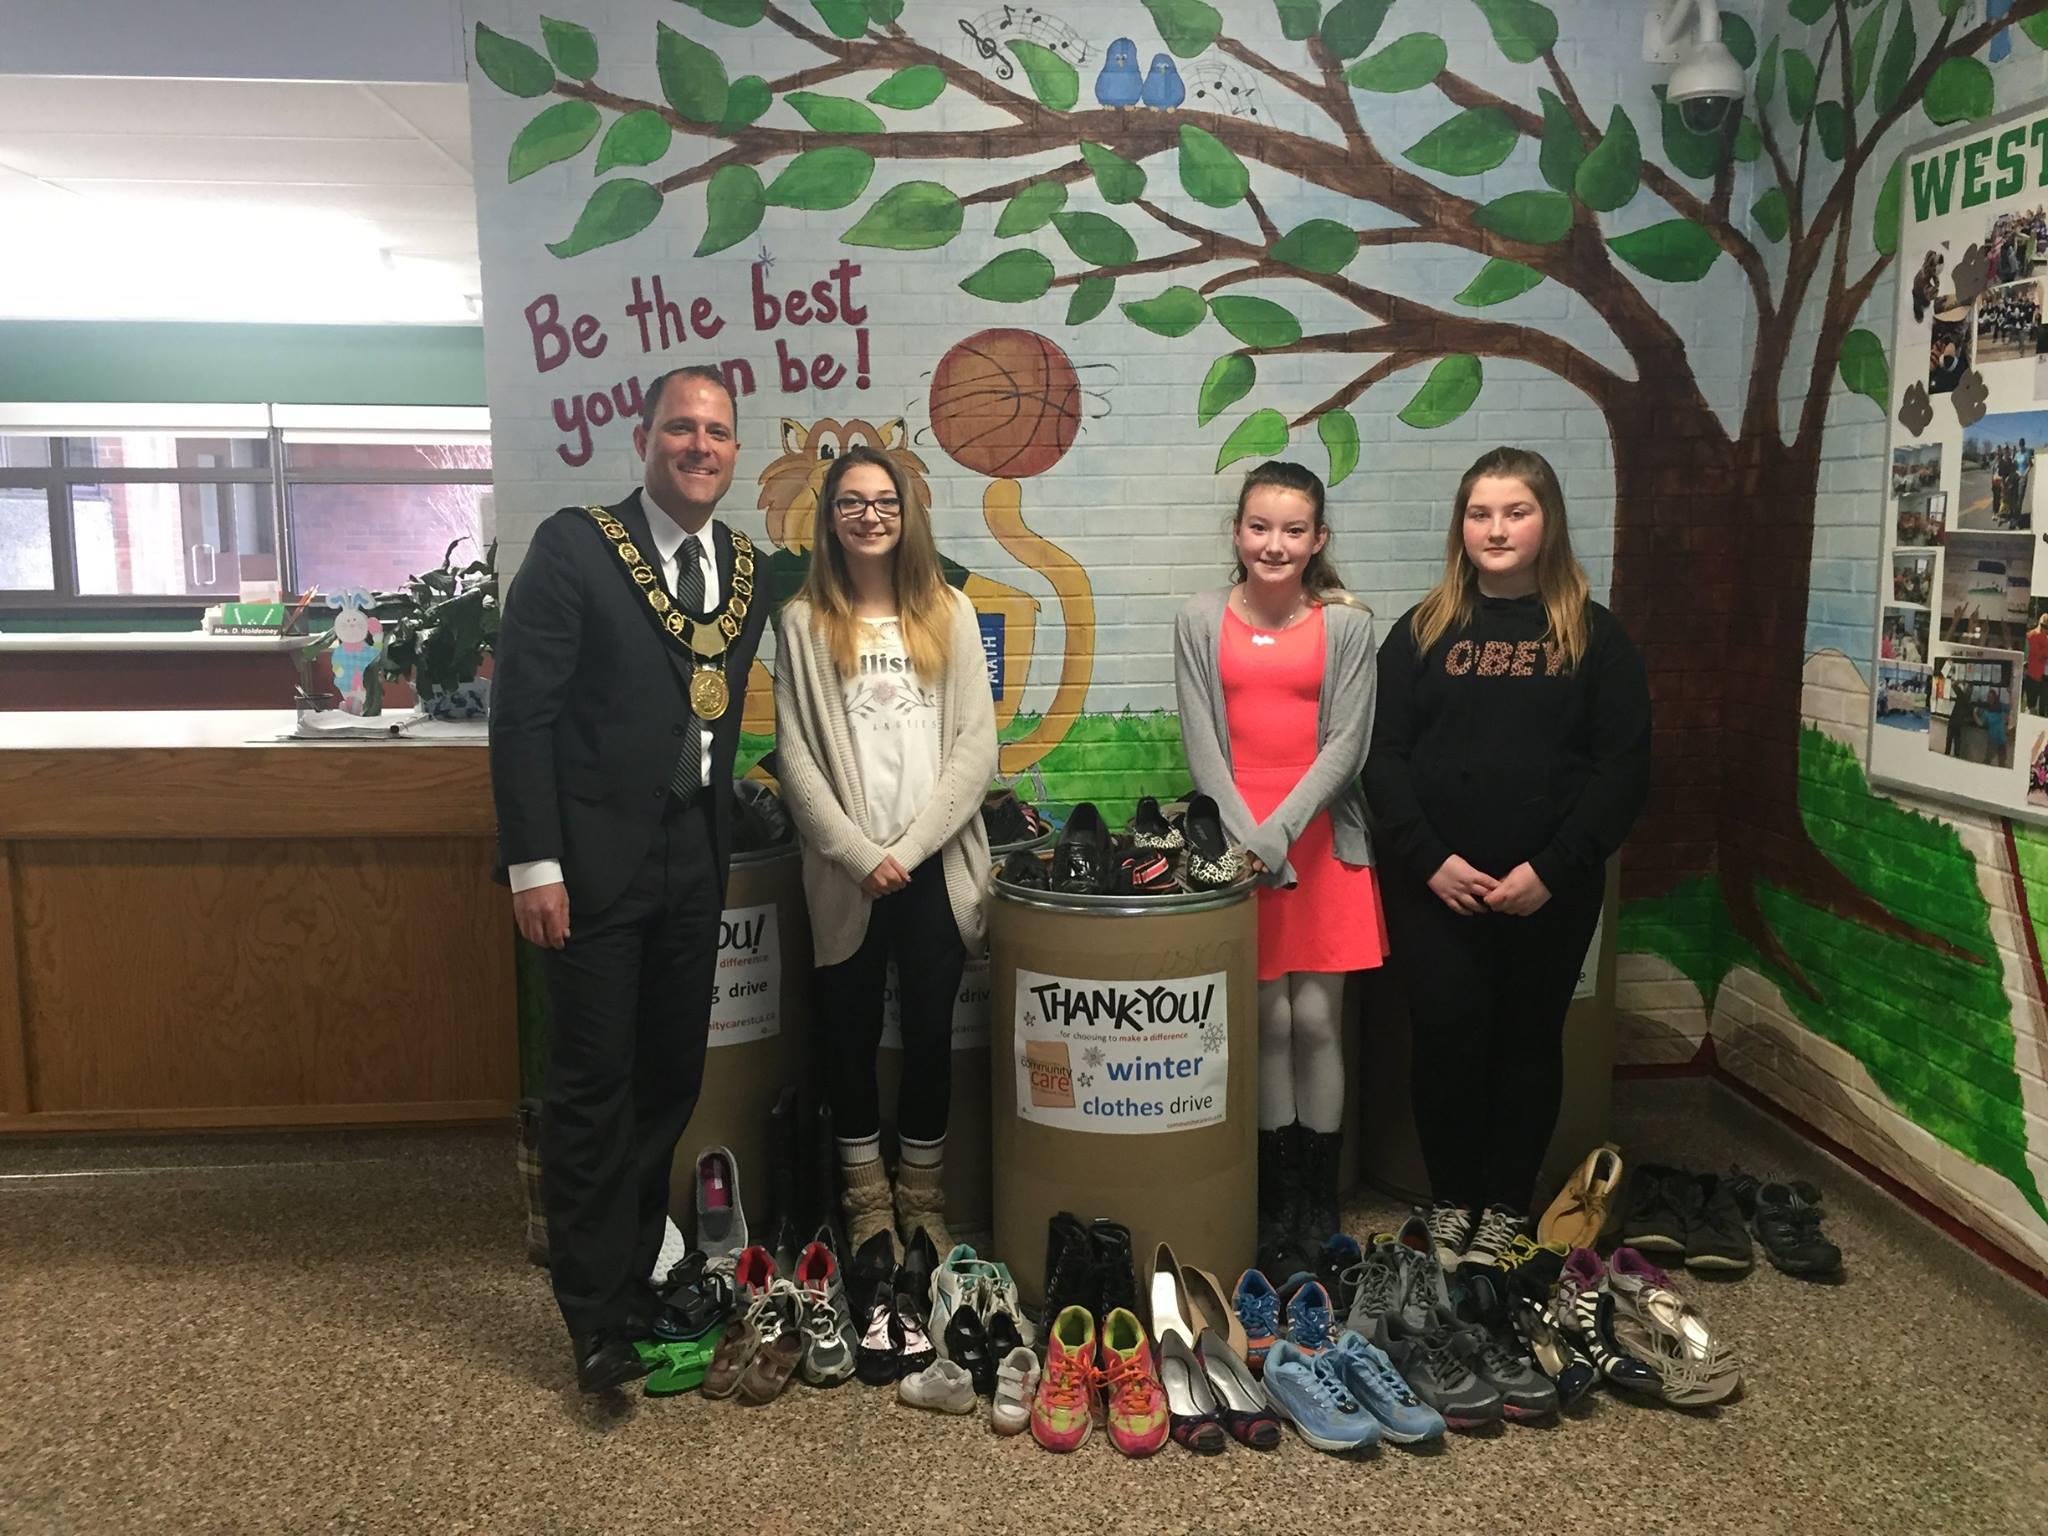 Sharing Shoes at Westdale Public School DSBN